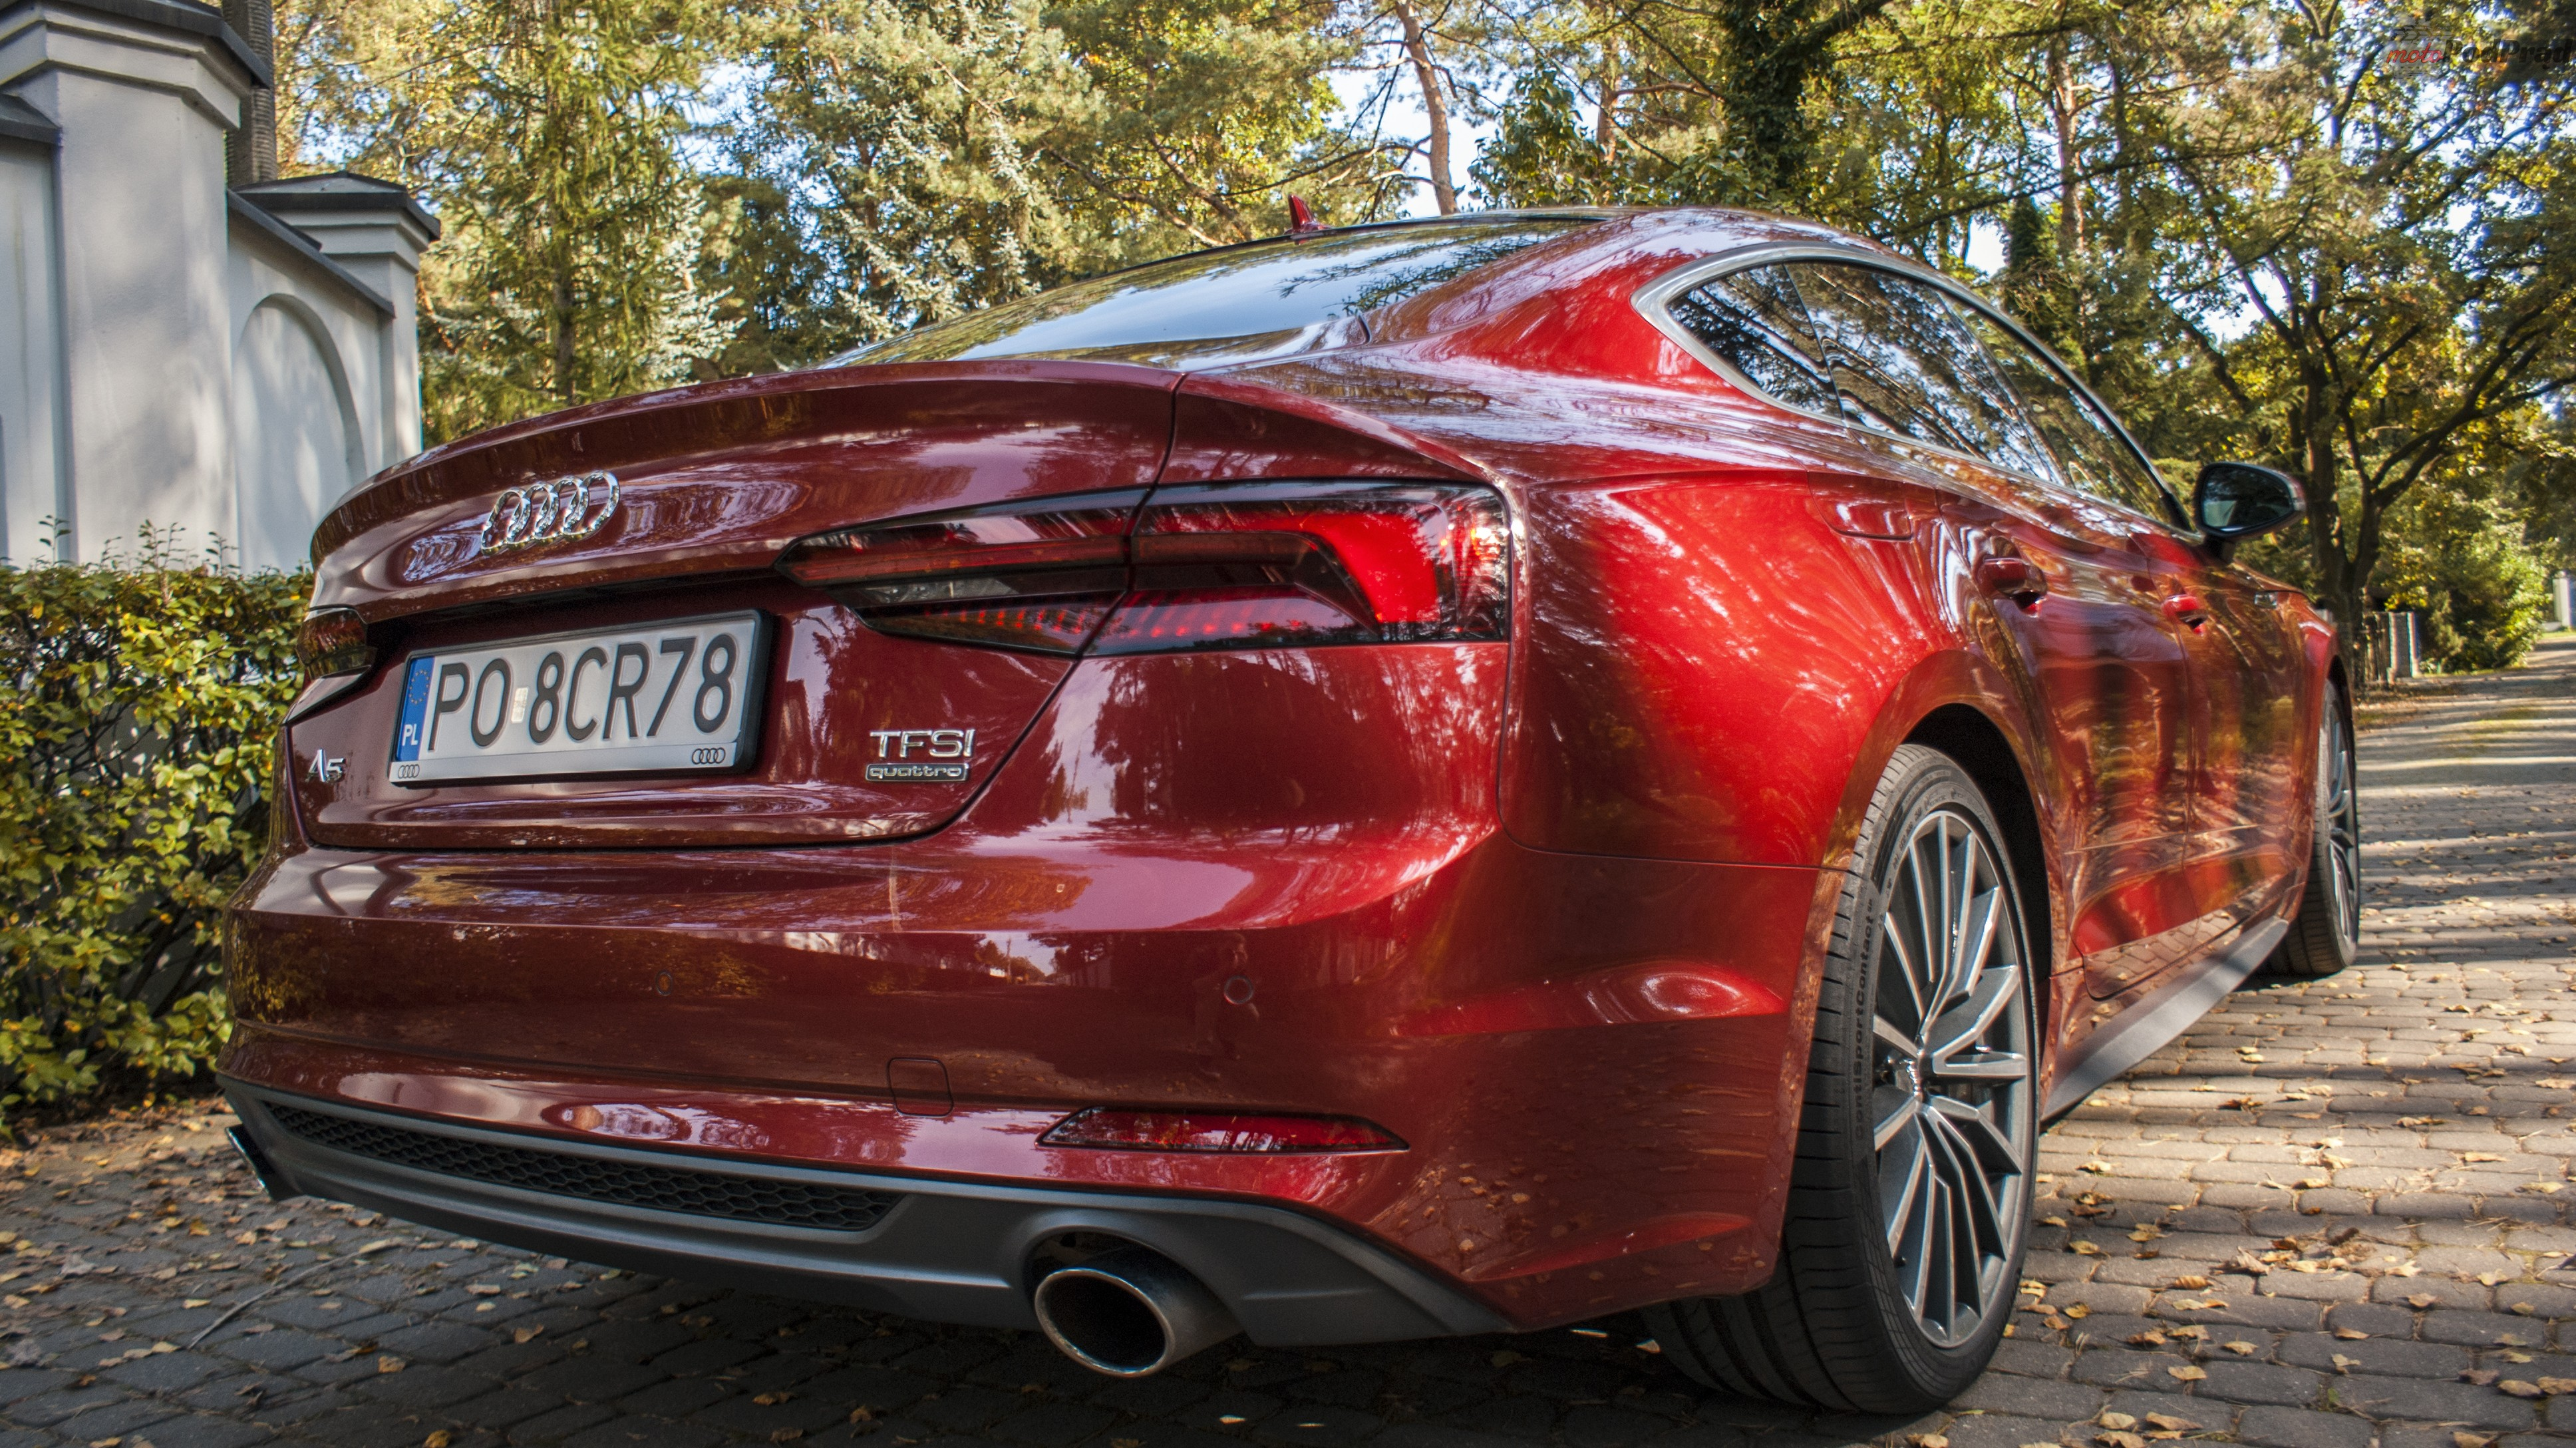 DSC01869 Test: Audi A5 Sportback 2.0 TFSI Quattro   Kwestia opakowania.